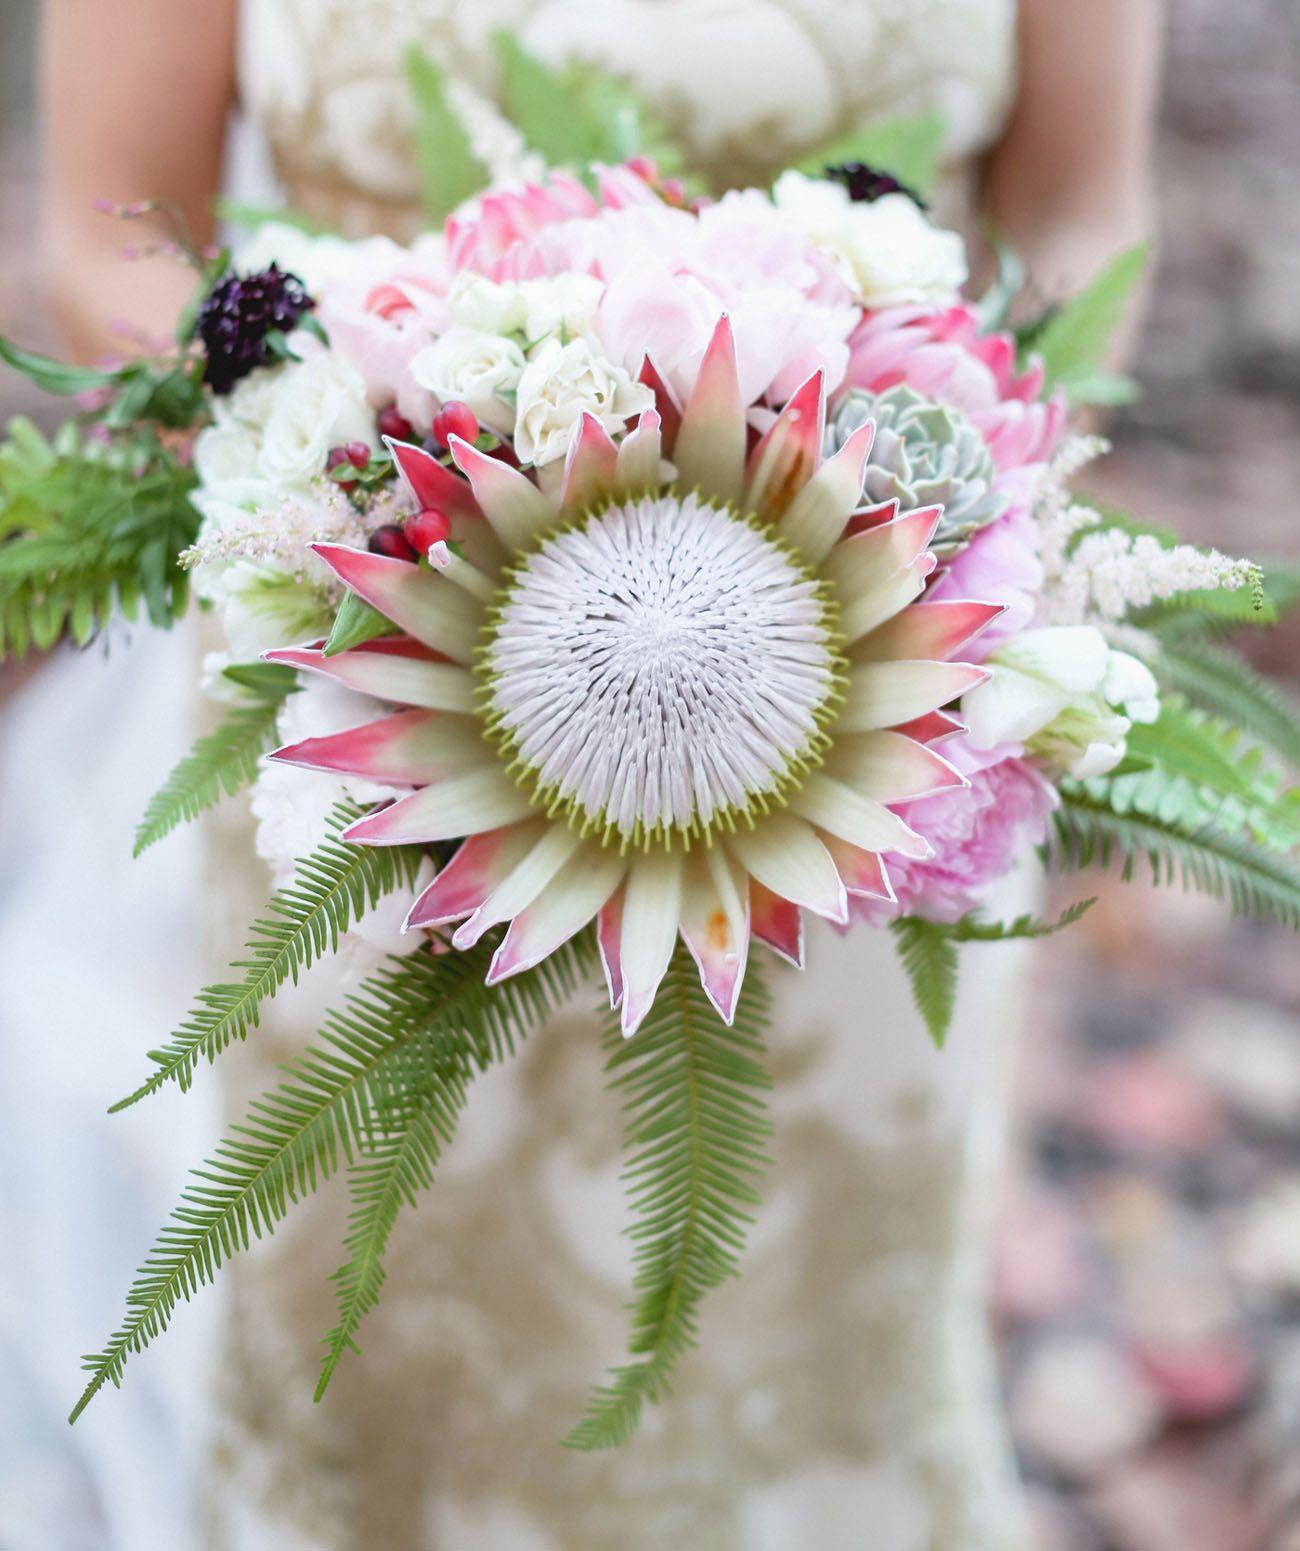 Protea Wedding Flowers: Havana Nights Wedding On Valentine's Day: Hilary + David